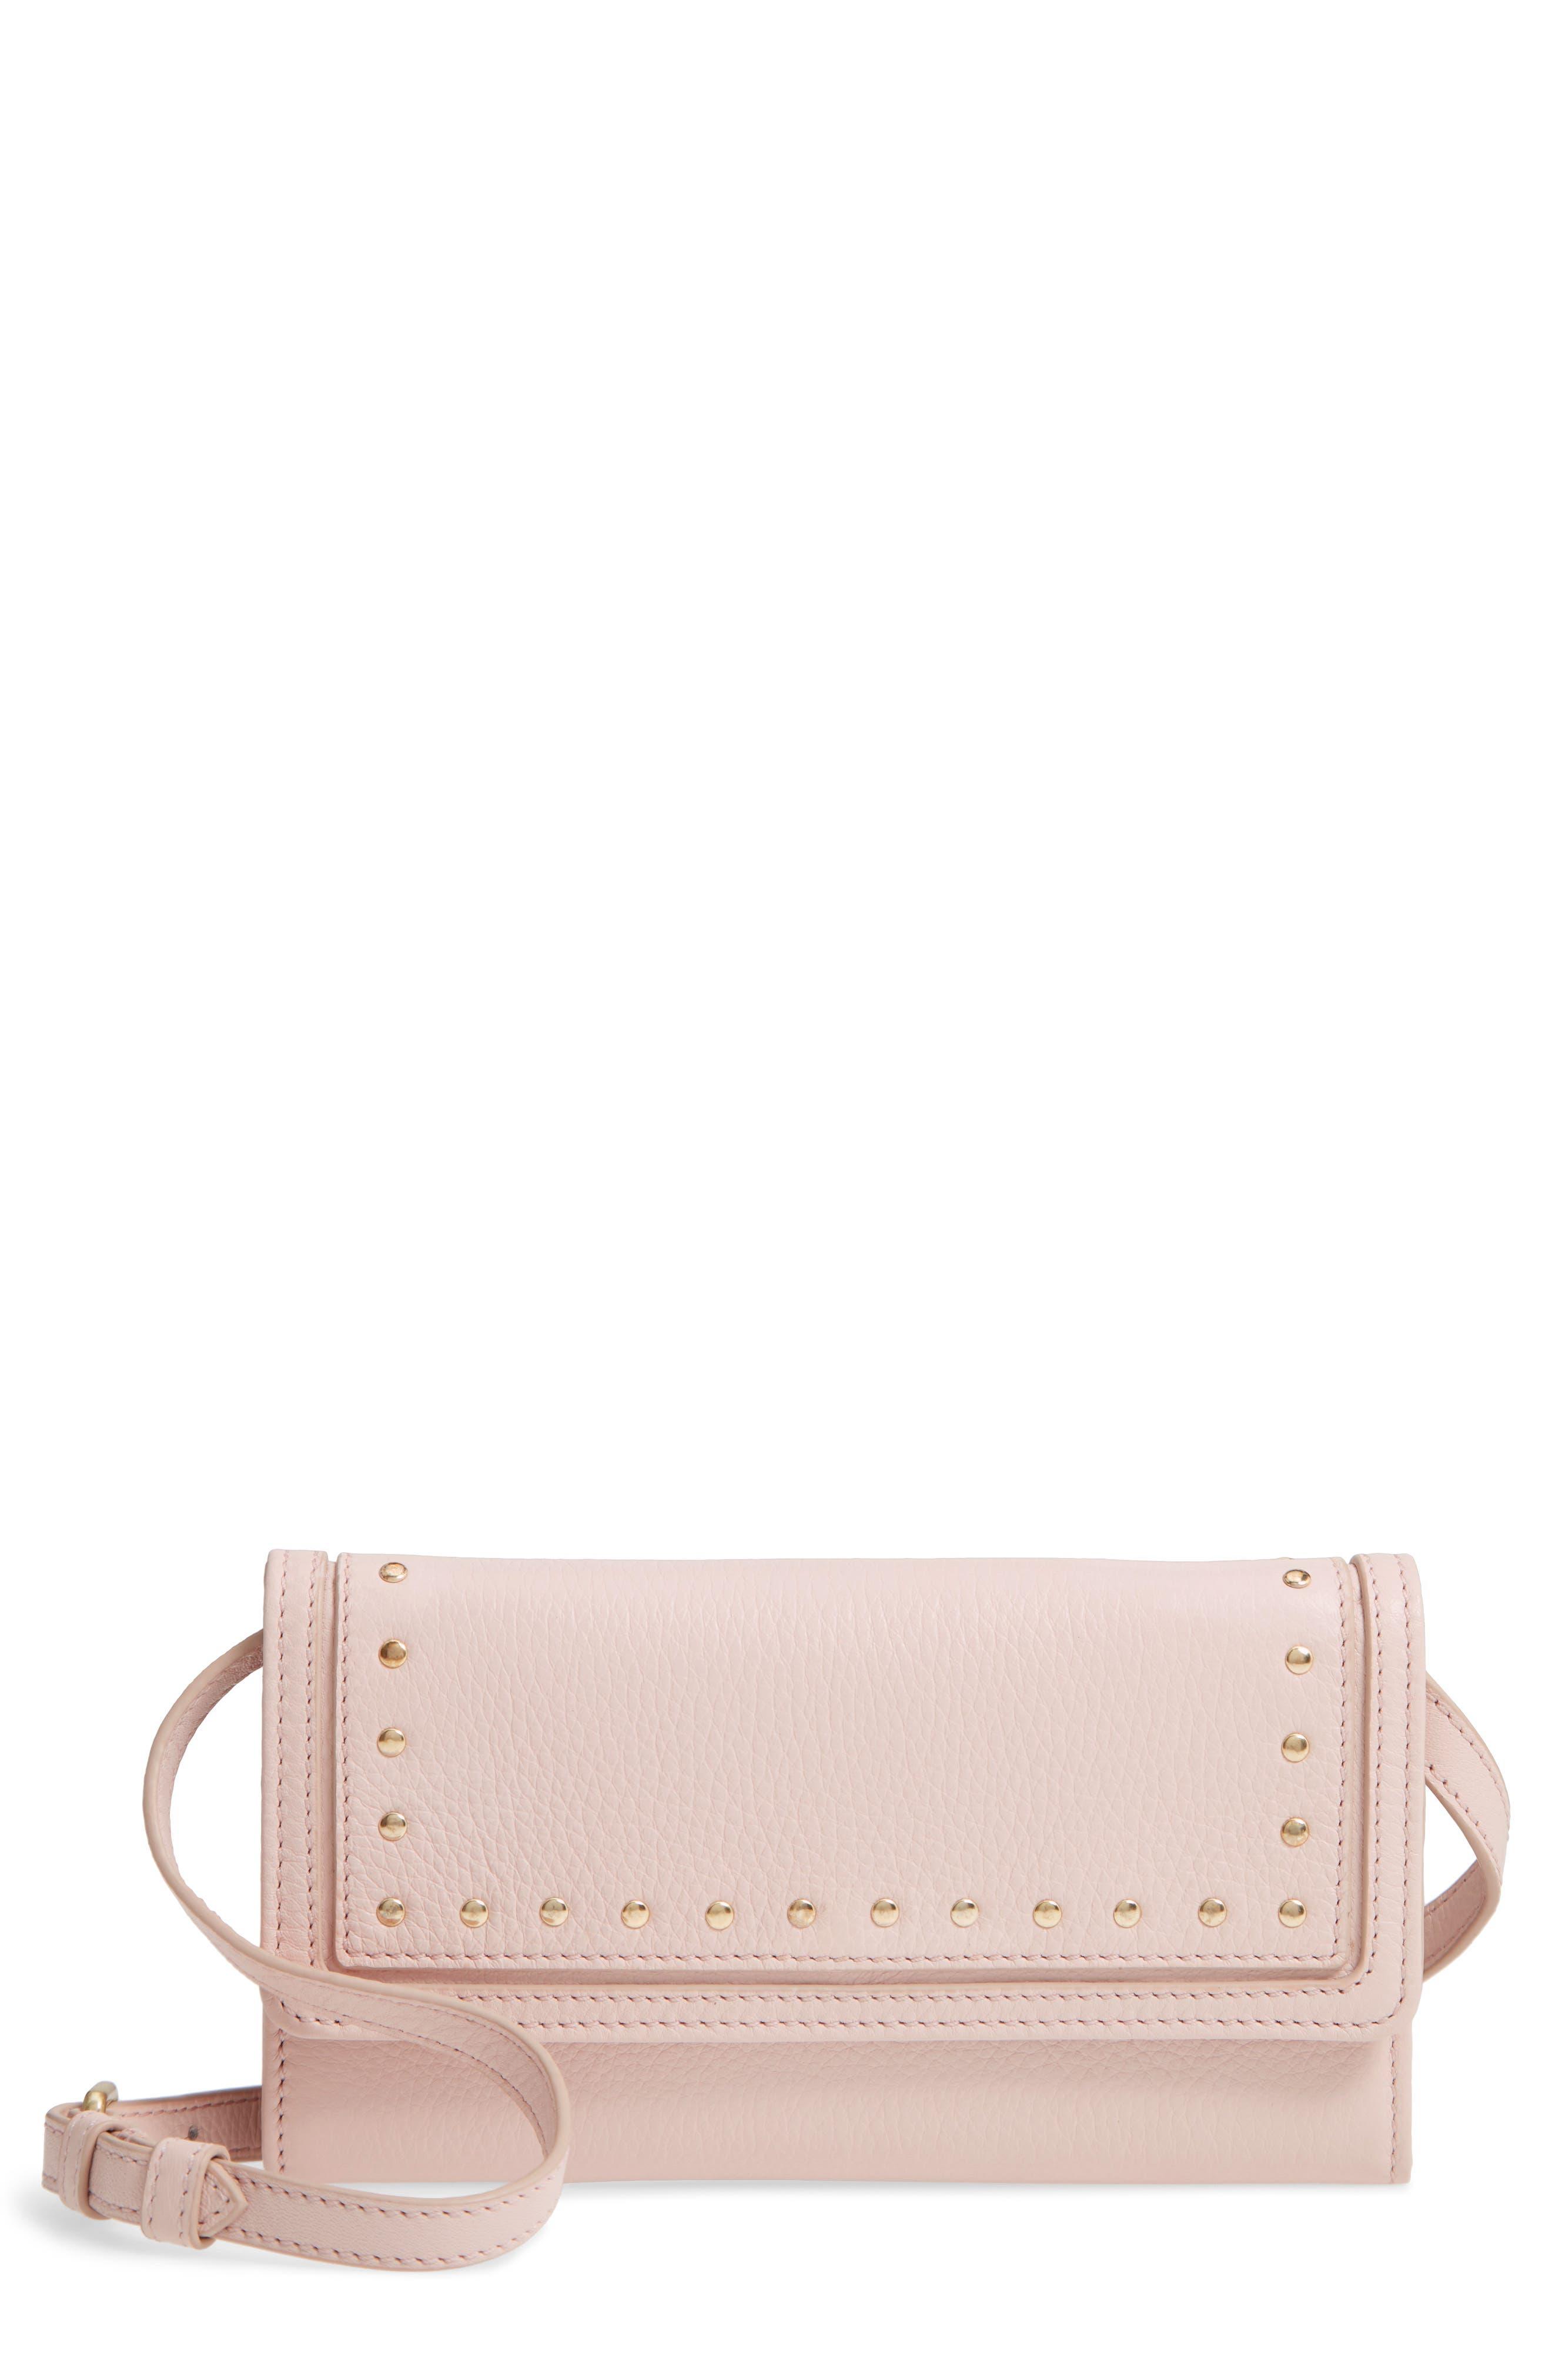 Cassidy Leather RFID Crossbody Wallet,                         Main,                         color, Peach Blush